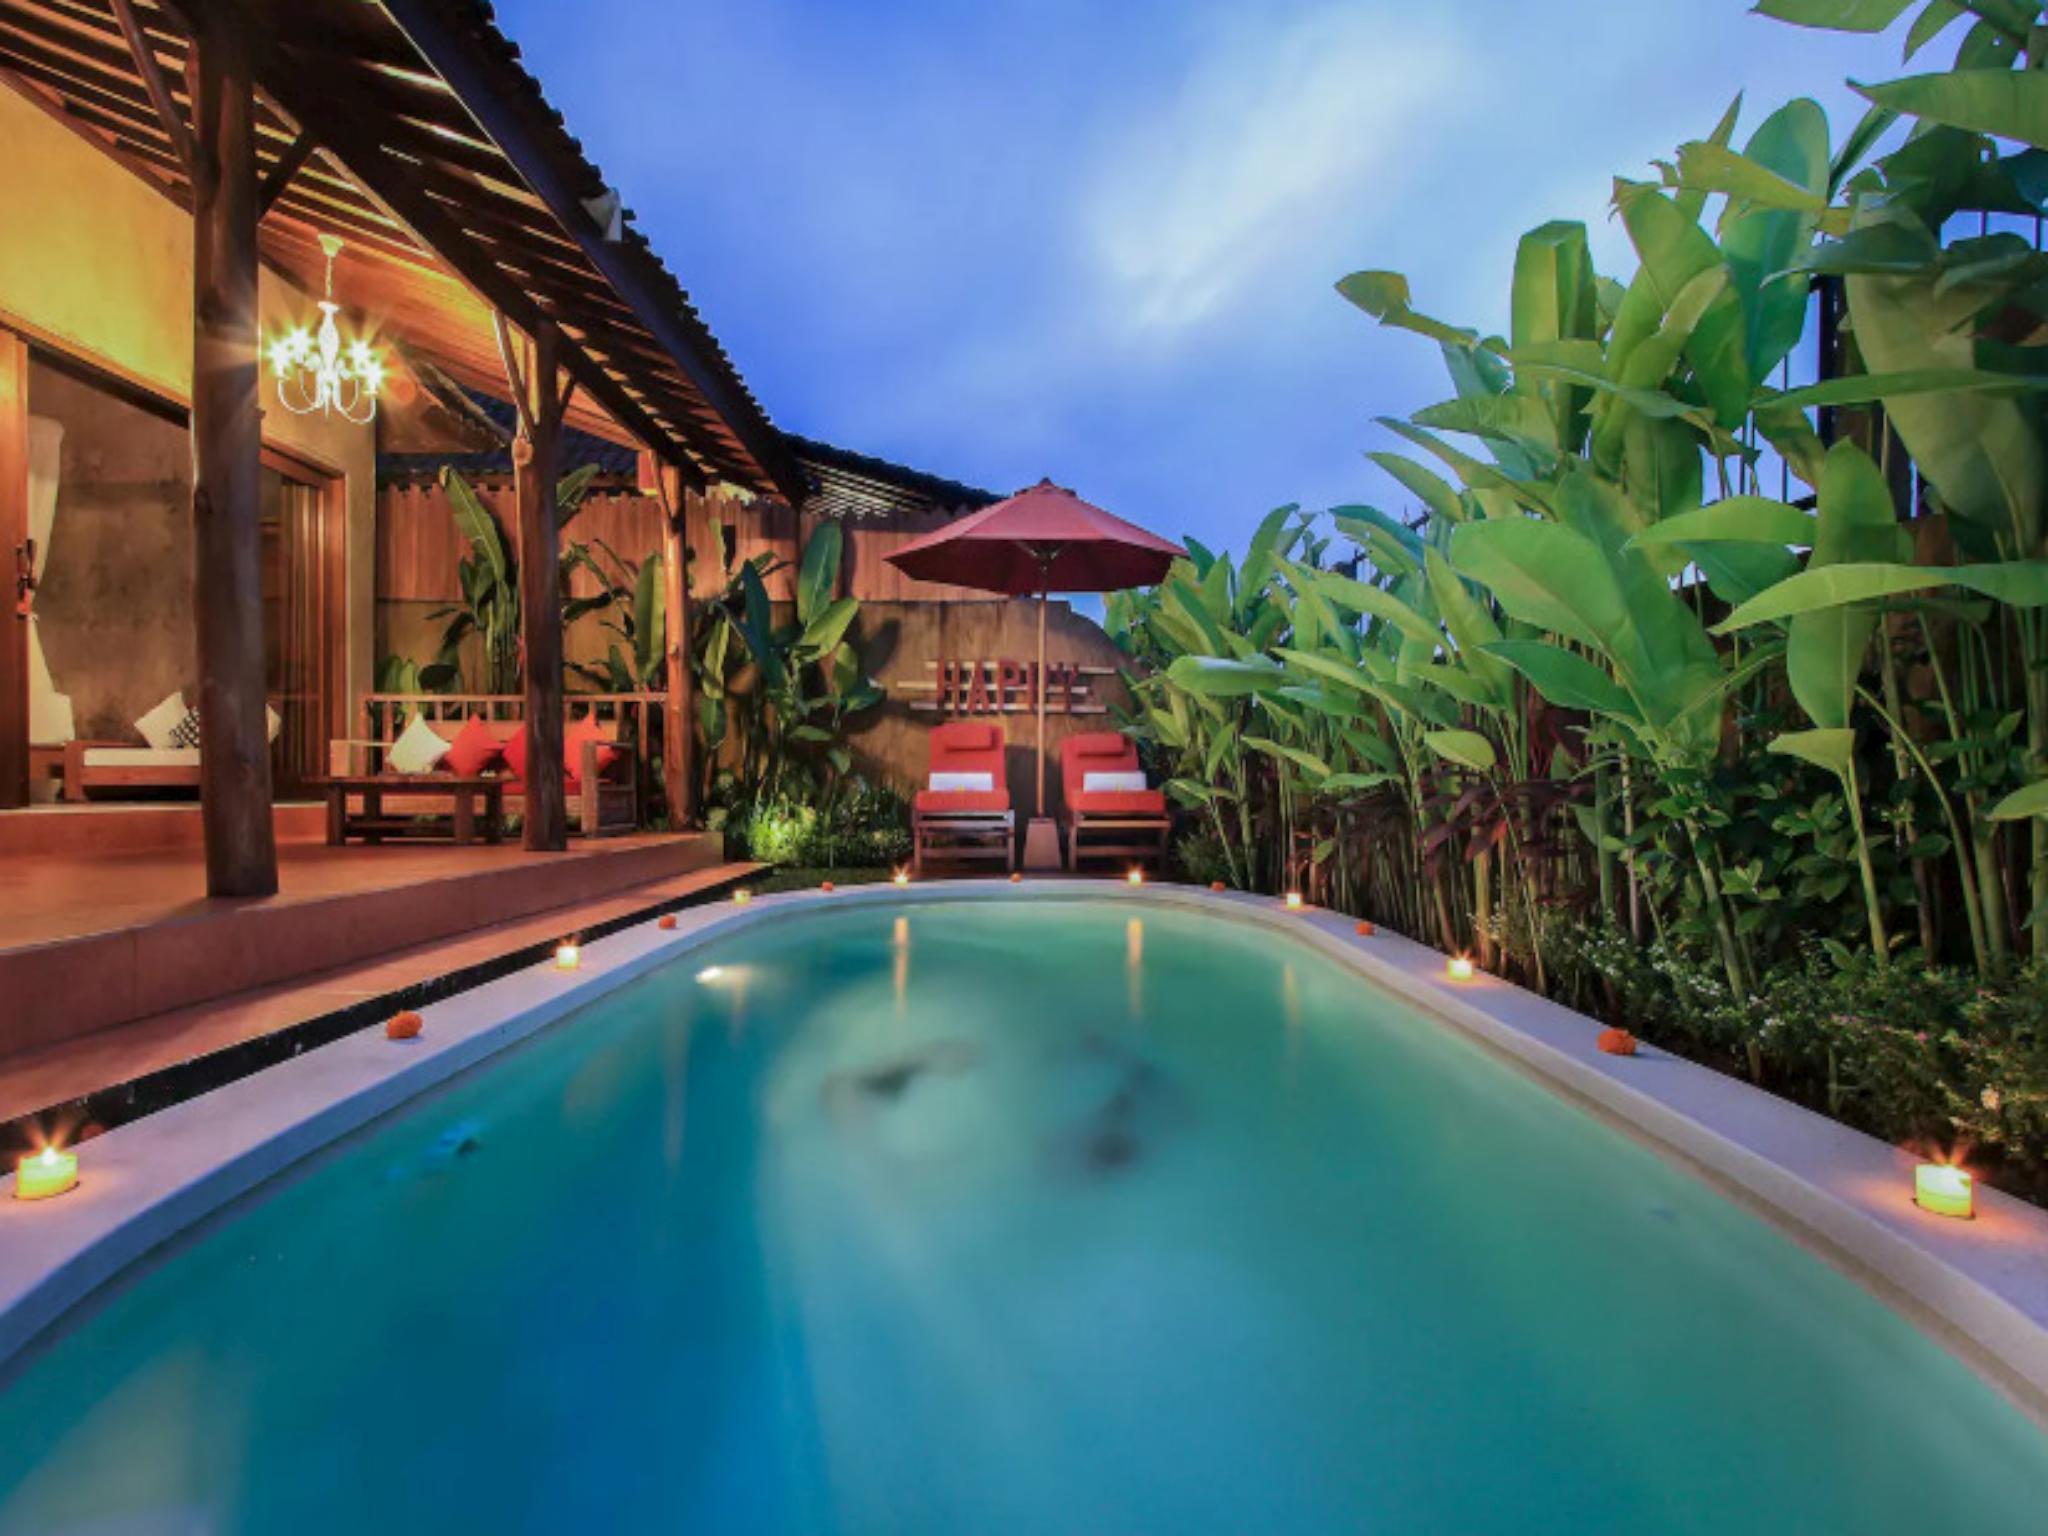 Candy Villa Orange Villa Bali 2020 Updated Deals 3792 Hd Photos Reviews